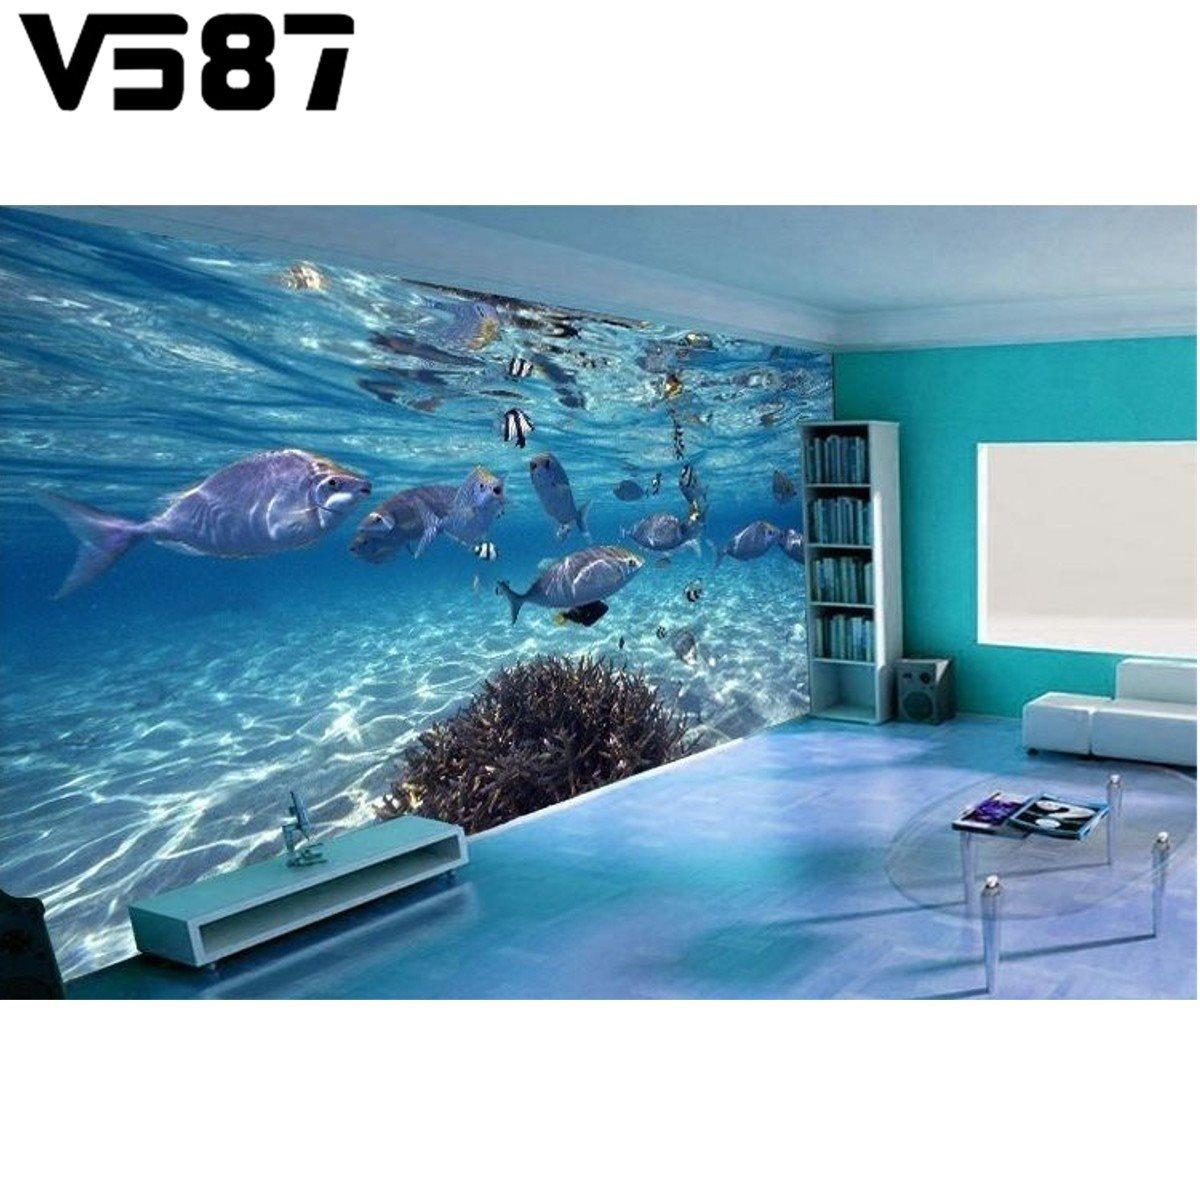 https://ae01.alicdn.com/kf/HTB1iTkYJpXXXXXVapXXq6xXFXXXo/3D-Sea-World-Wall-Sticker-Art-Wall-Mural-TV-Background-Design-Decoration-Craft-Bedroom-font-b.jpg